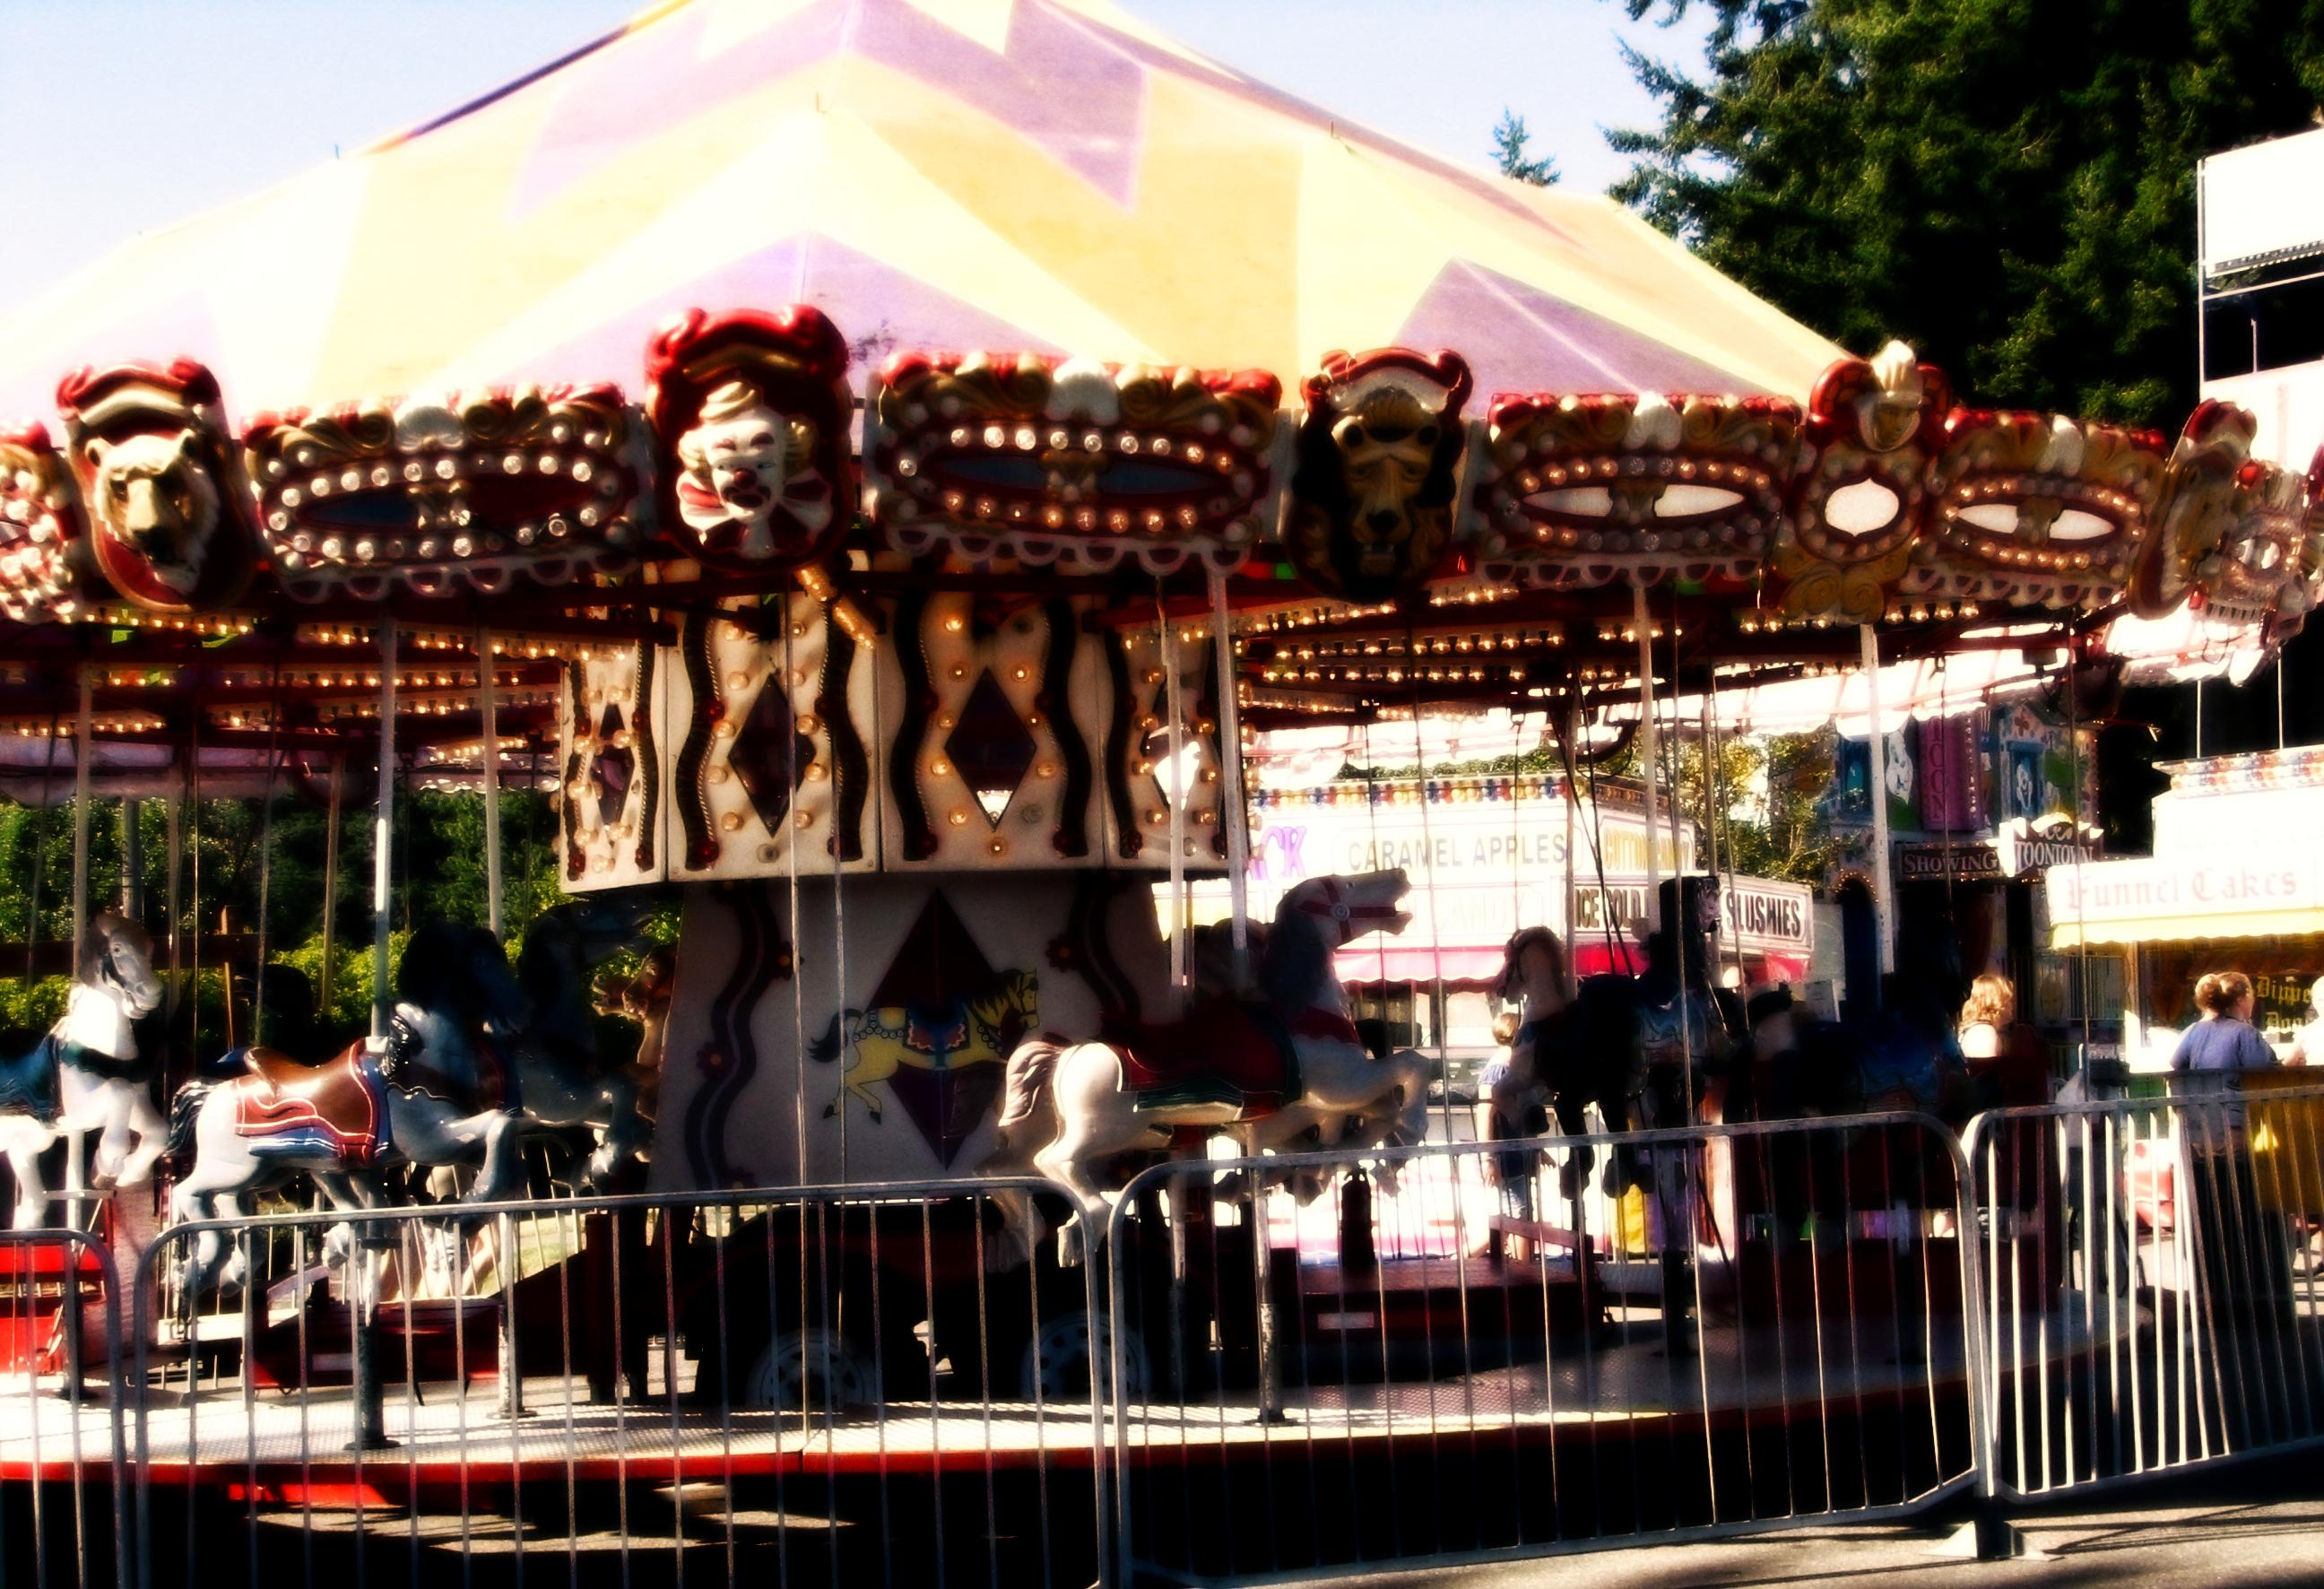 the county fair Washington county fair board meeting apr 04, 2018 washington county fair complex - the perfect place for everything 5036481416 873 ne 34th avenue.